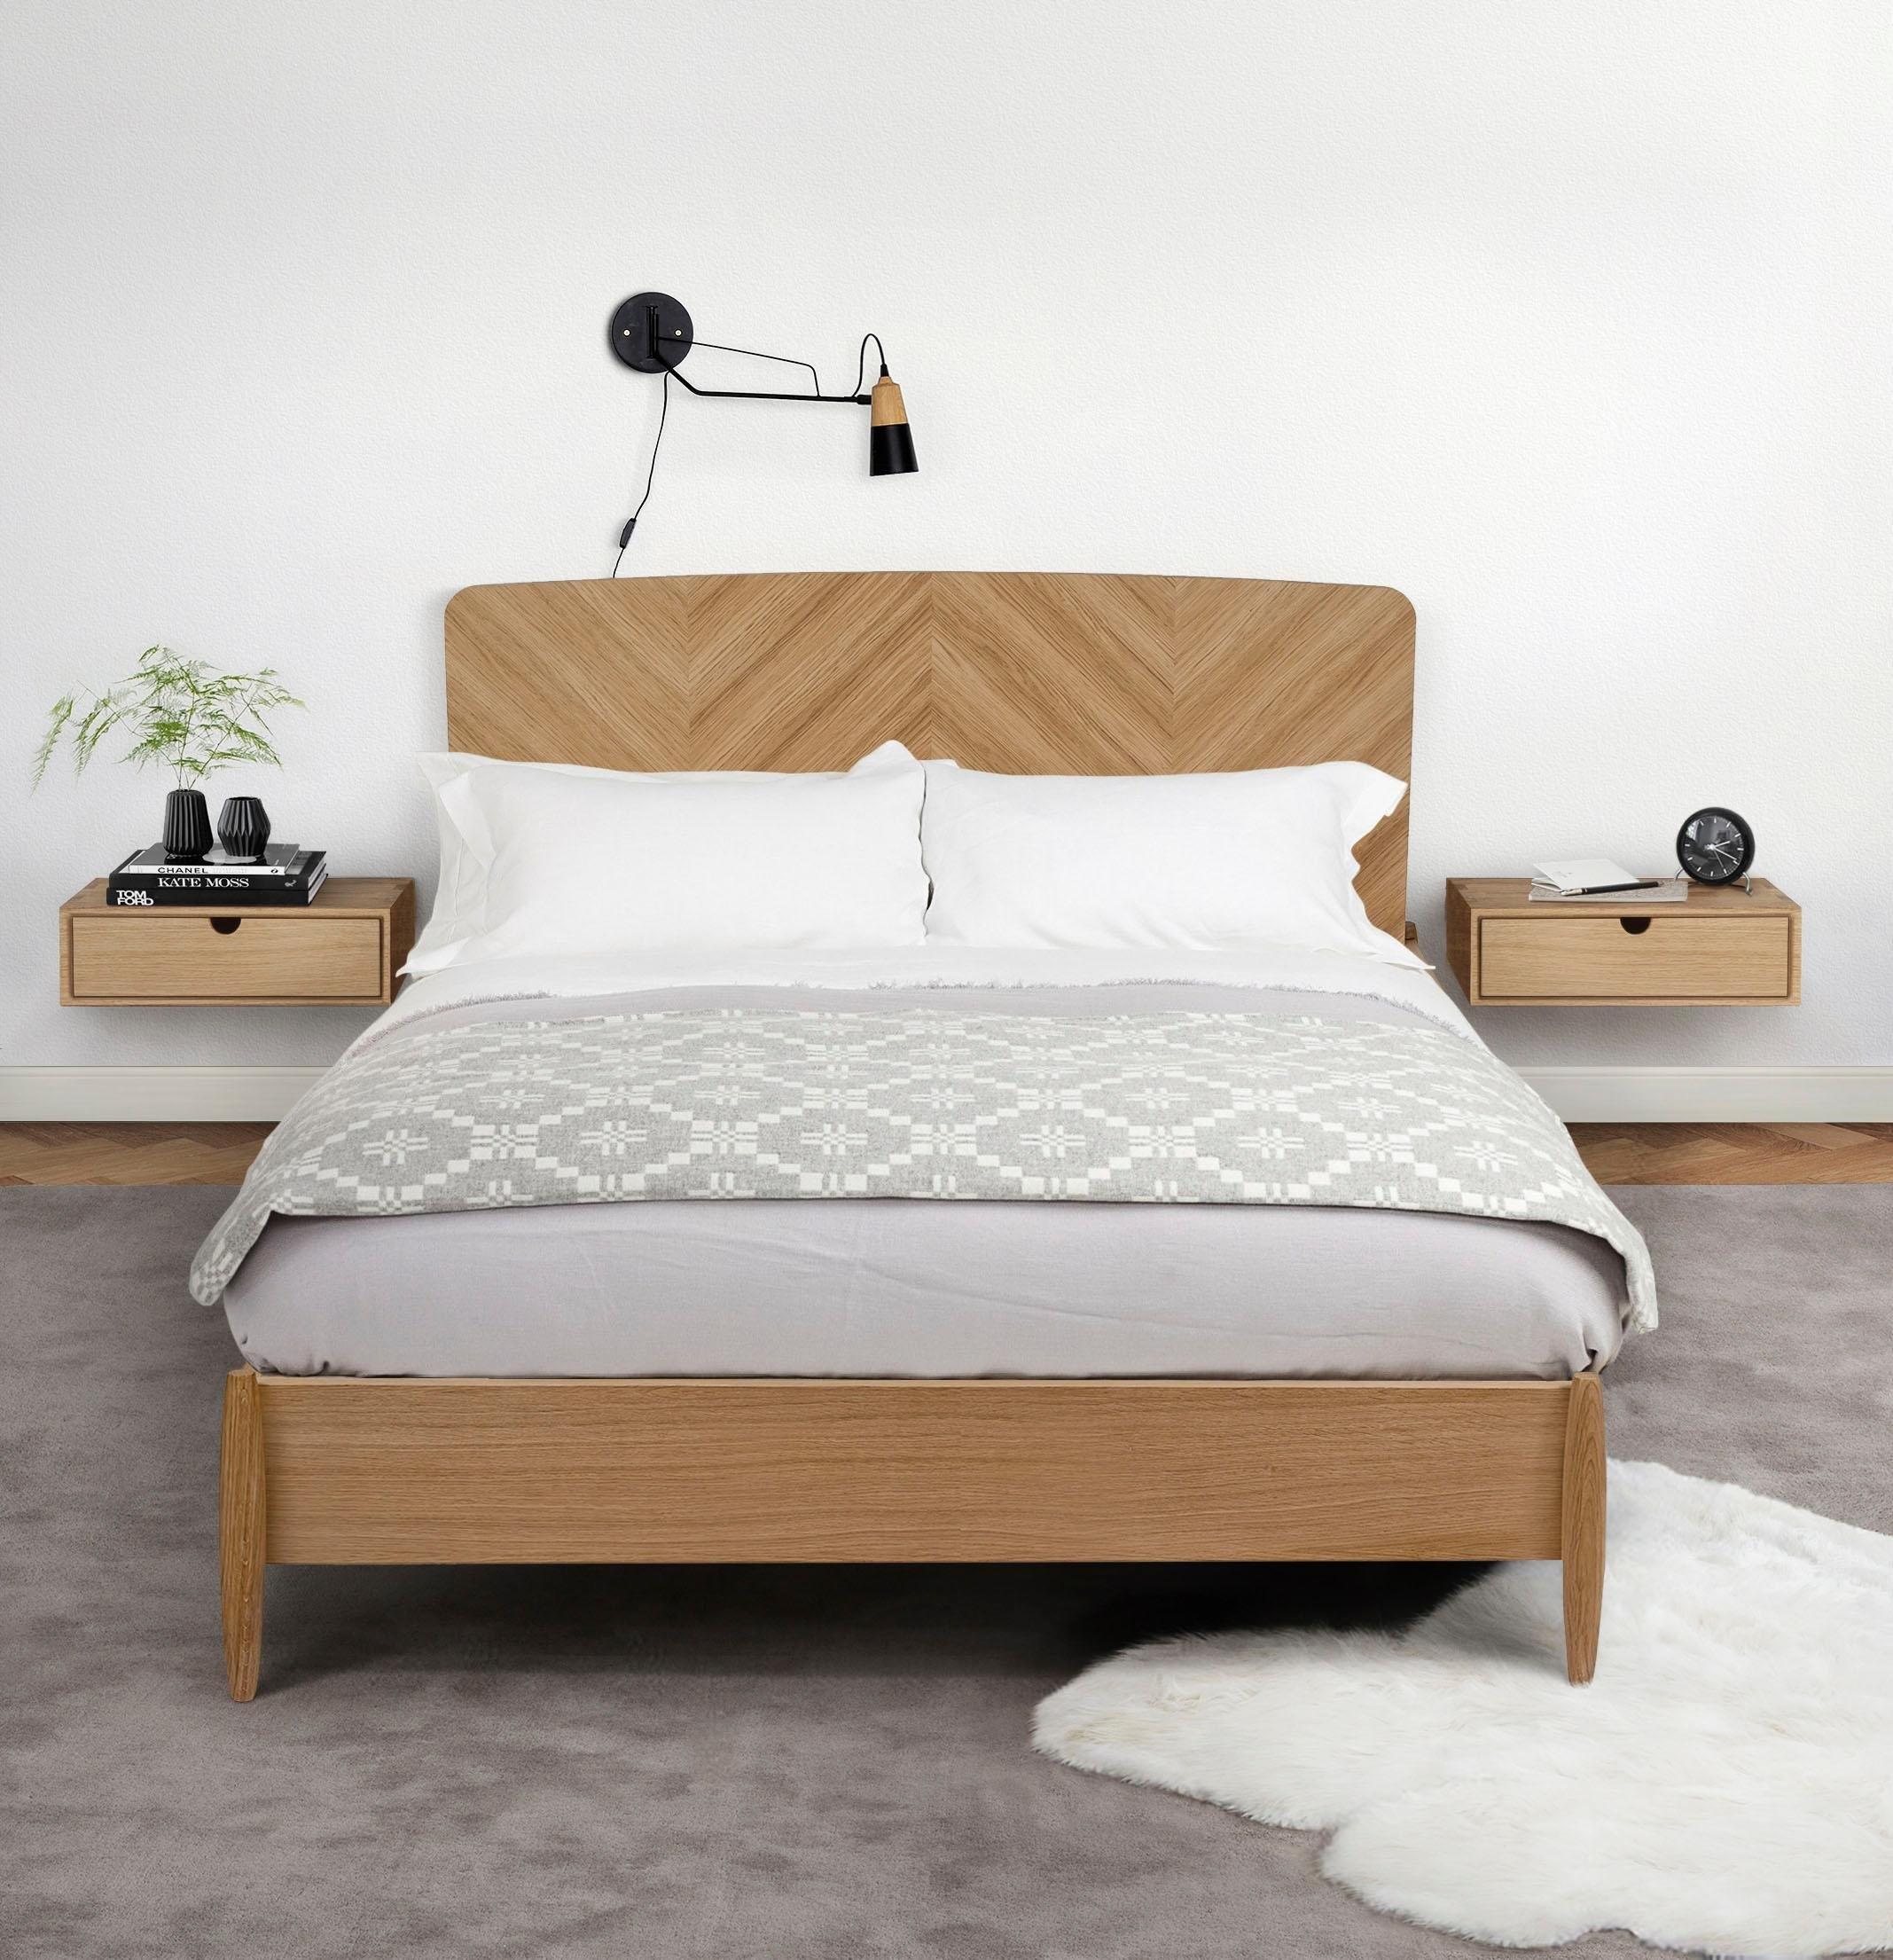 Woodman Massief Houten Ledikant Farsta 1 In Scandinavisch Design Snel Gevonden Otto